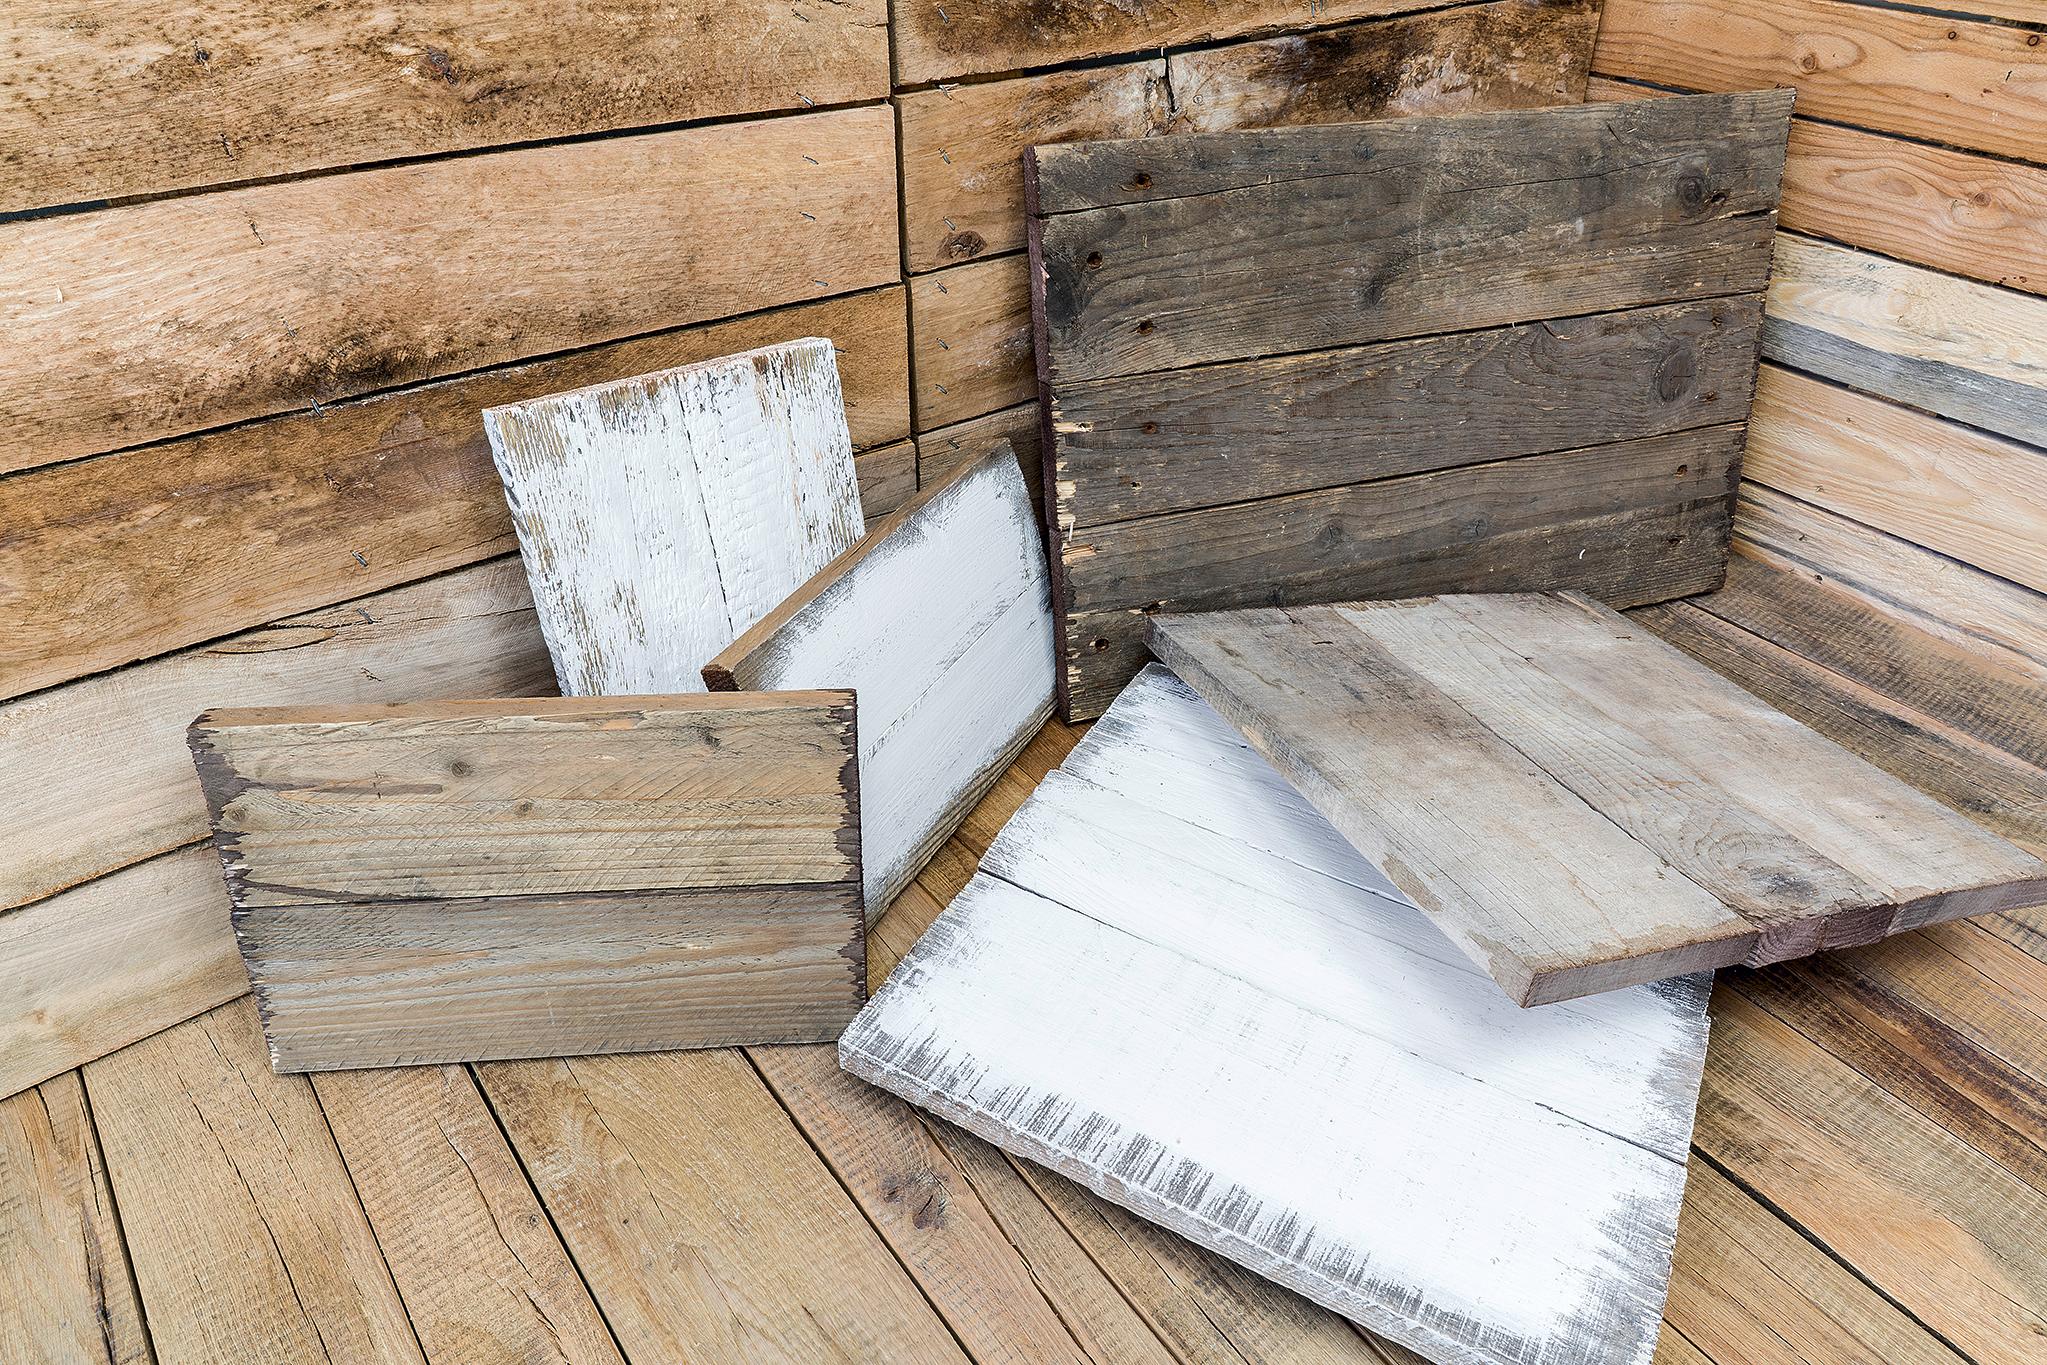 Fußboden Ohne Tni ~ Fußboden aus alten paletten palettenauszug boden net rack shop